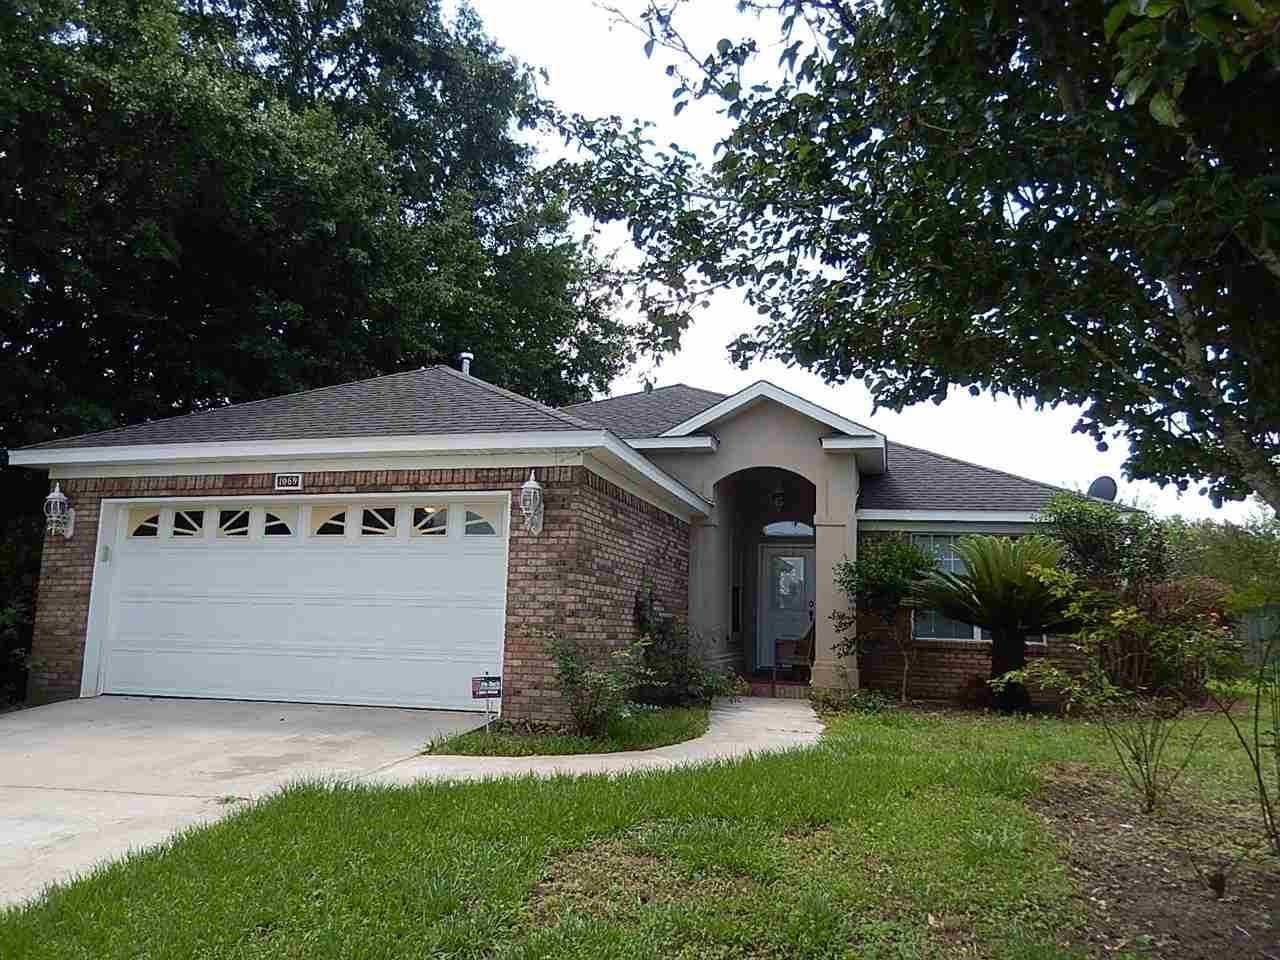 1069 Winter Lane Tallahassee, FL 32311 in Piney Z Photo 1